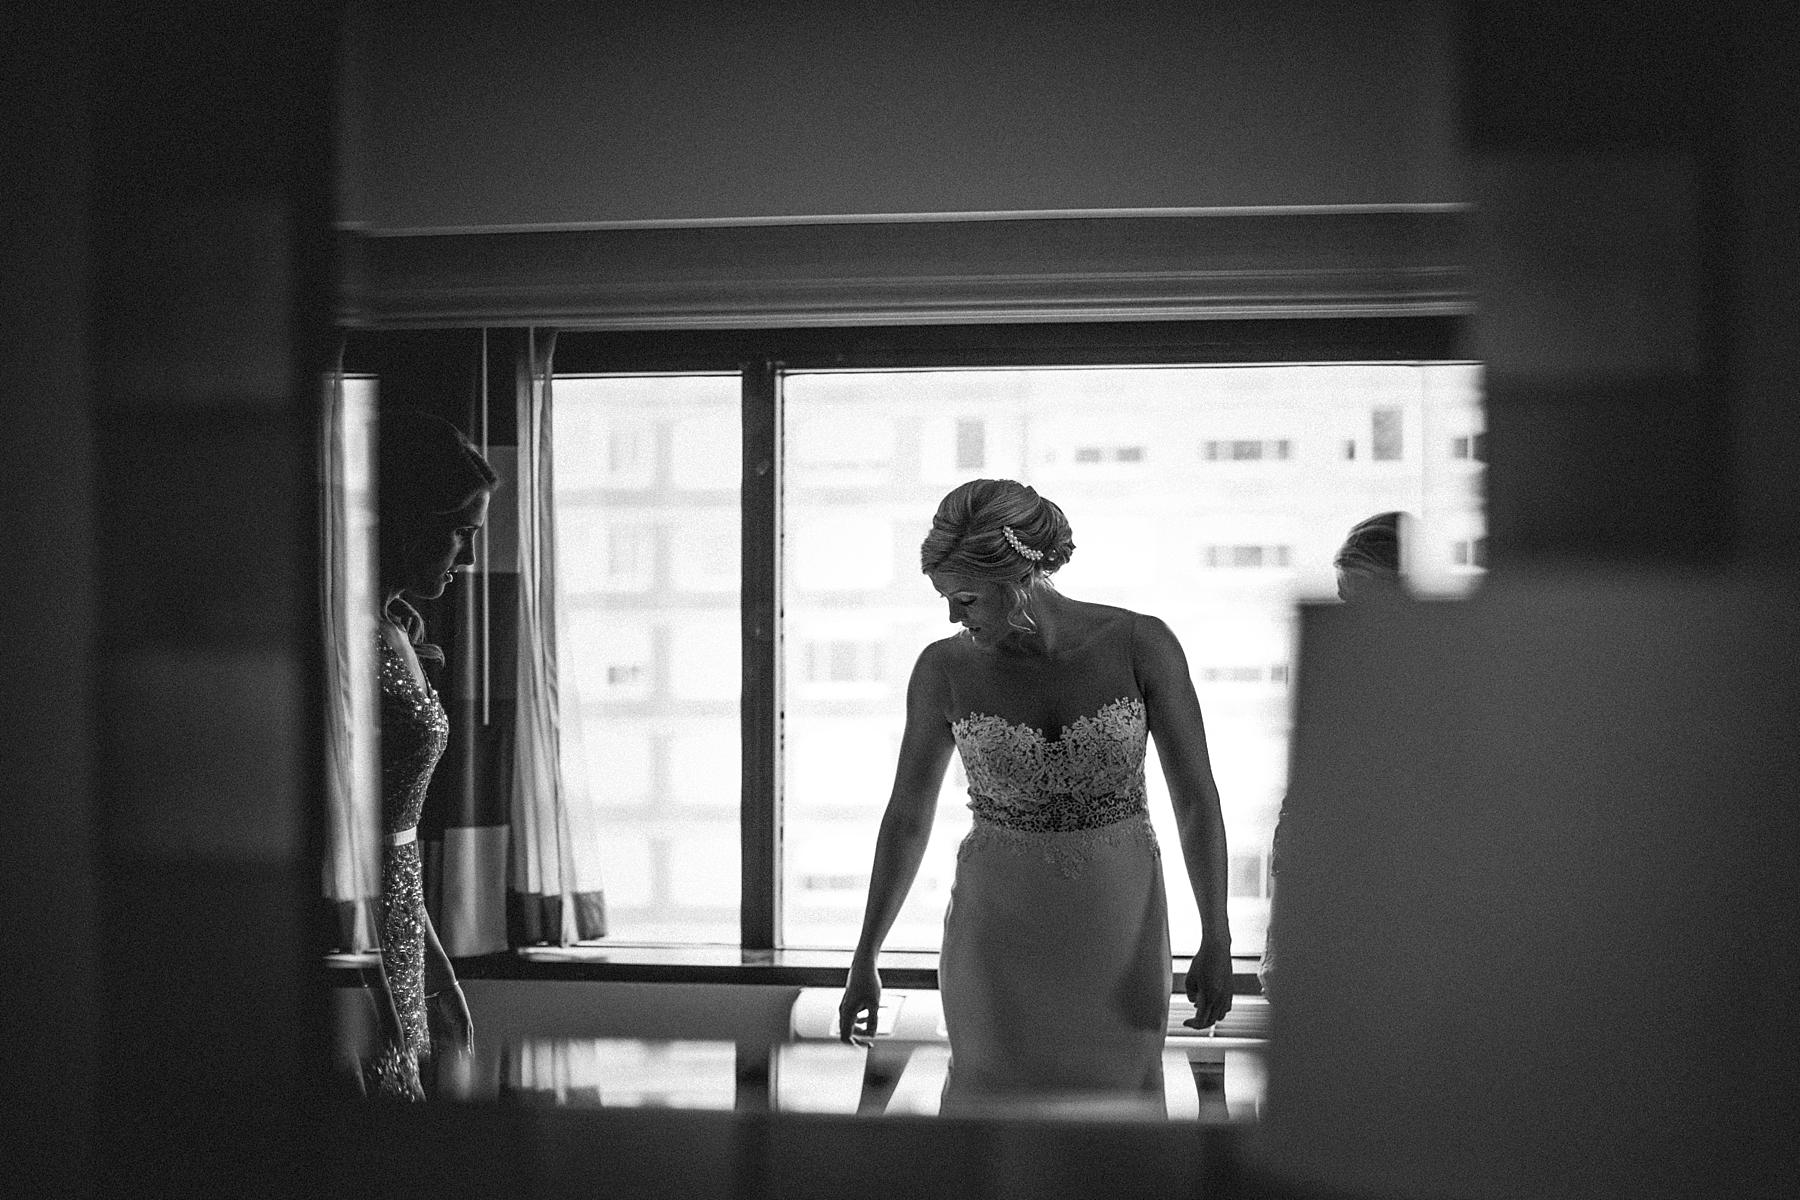 jersey-city-nj-wedding-photographer-top_0016.jpg